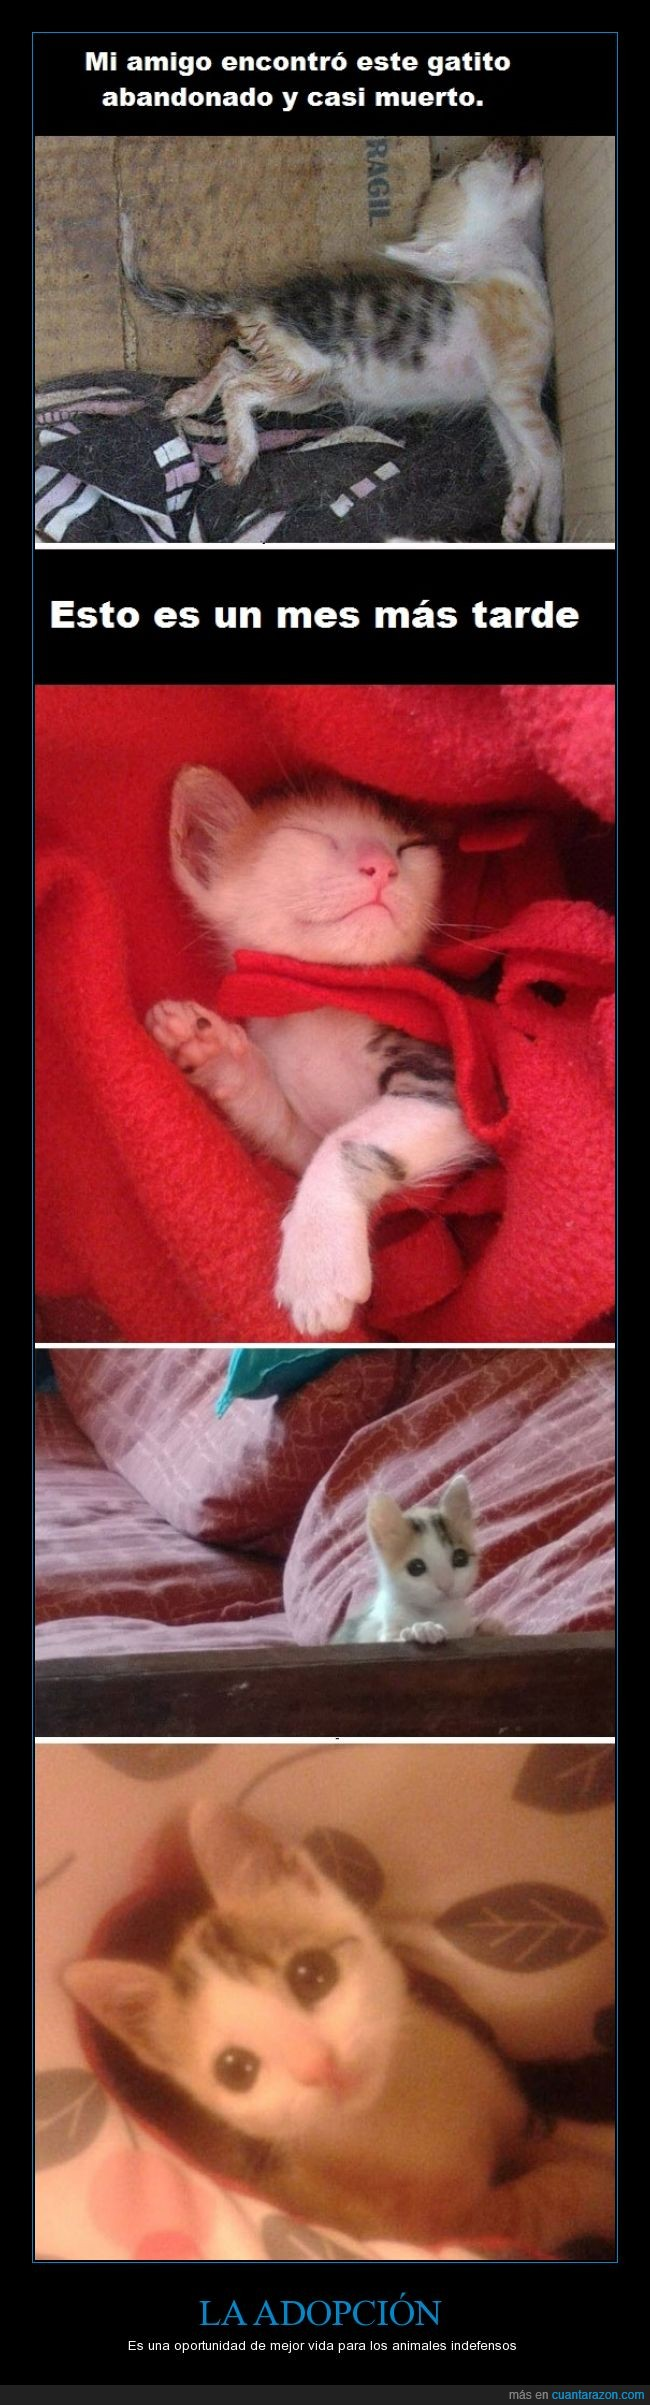 adopción,animales,gato,rescatar,salvar,vida. adoptar